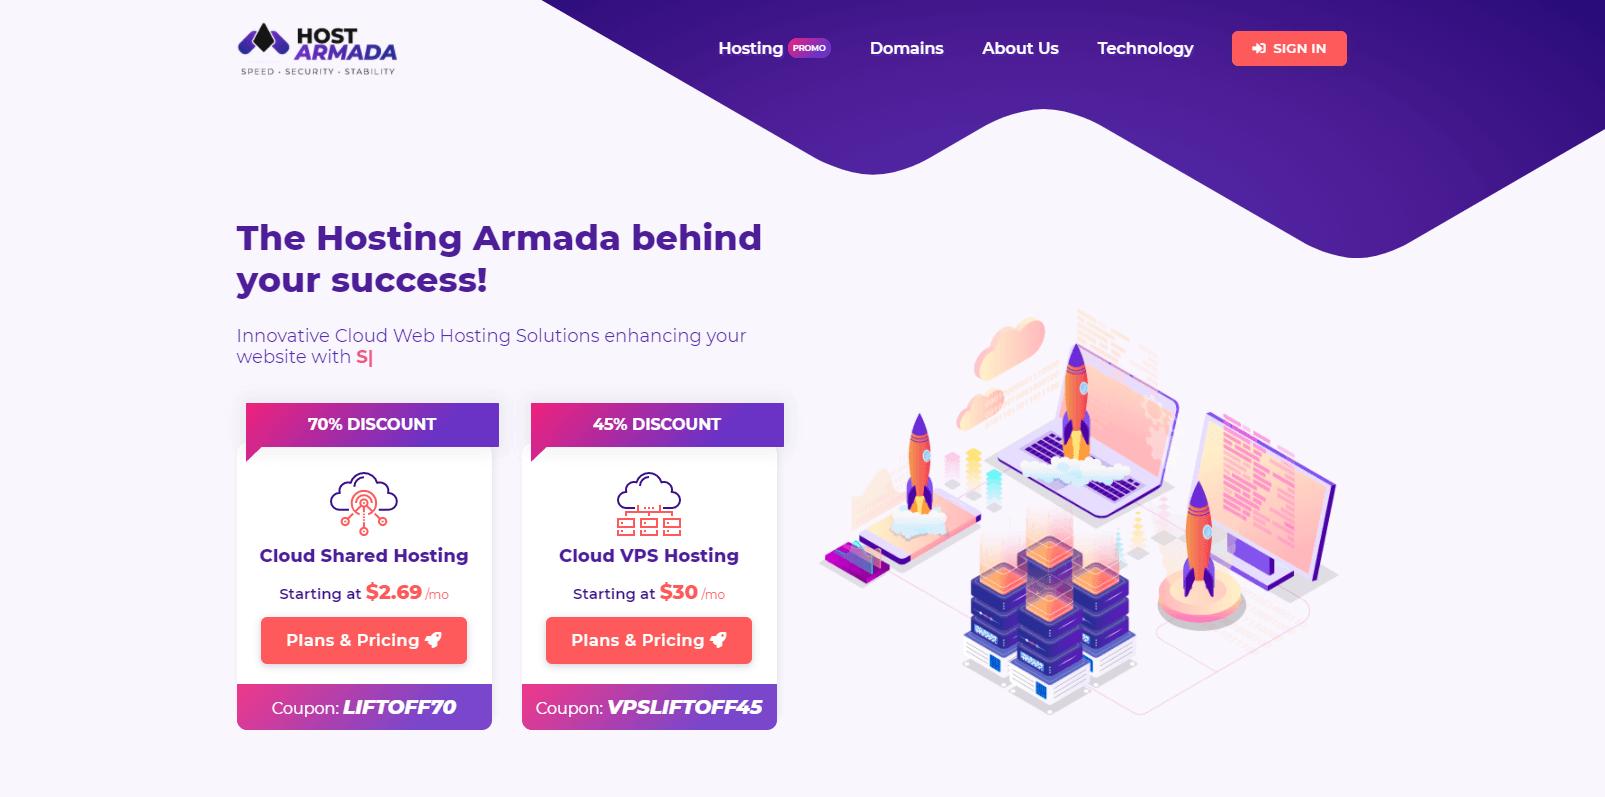 HostArmada landing page